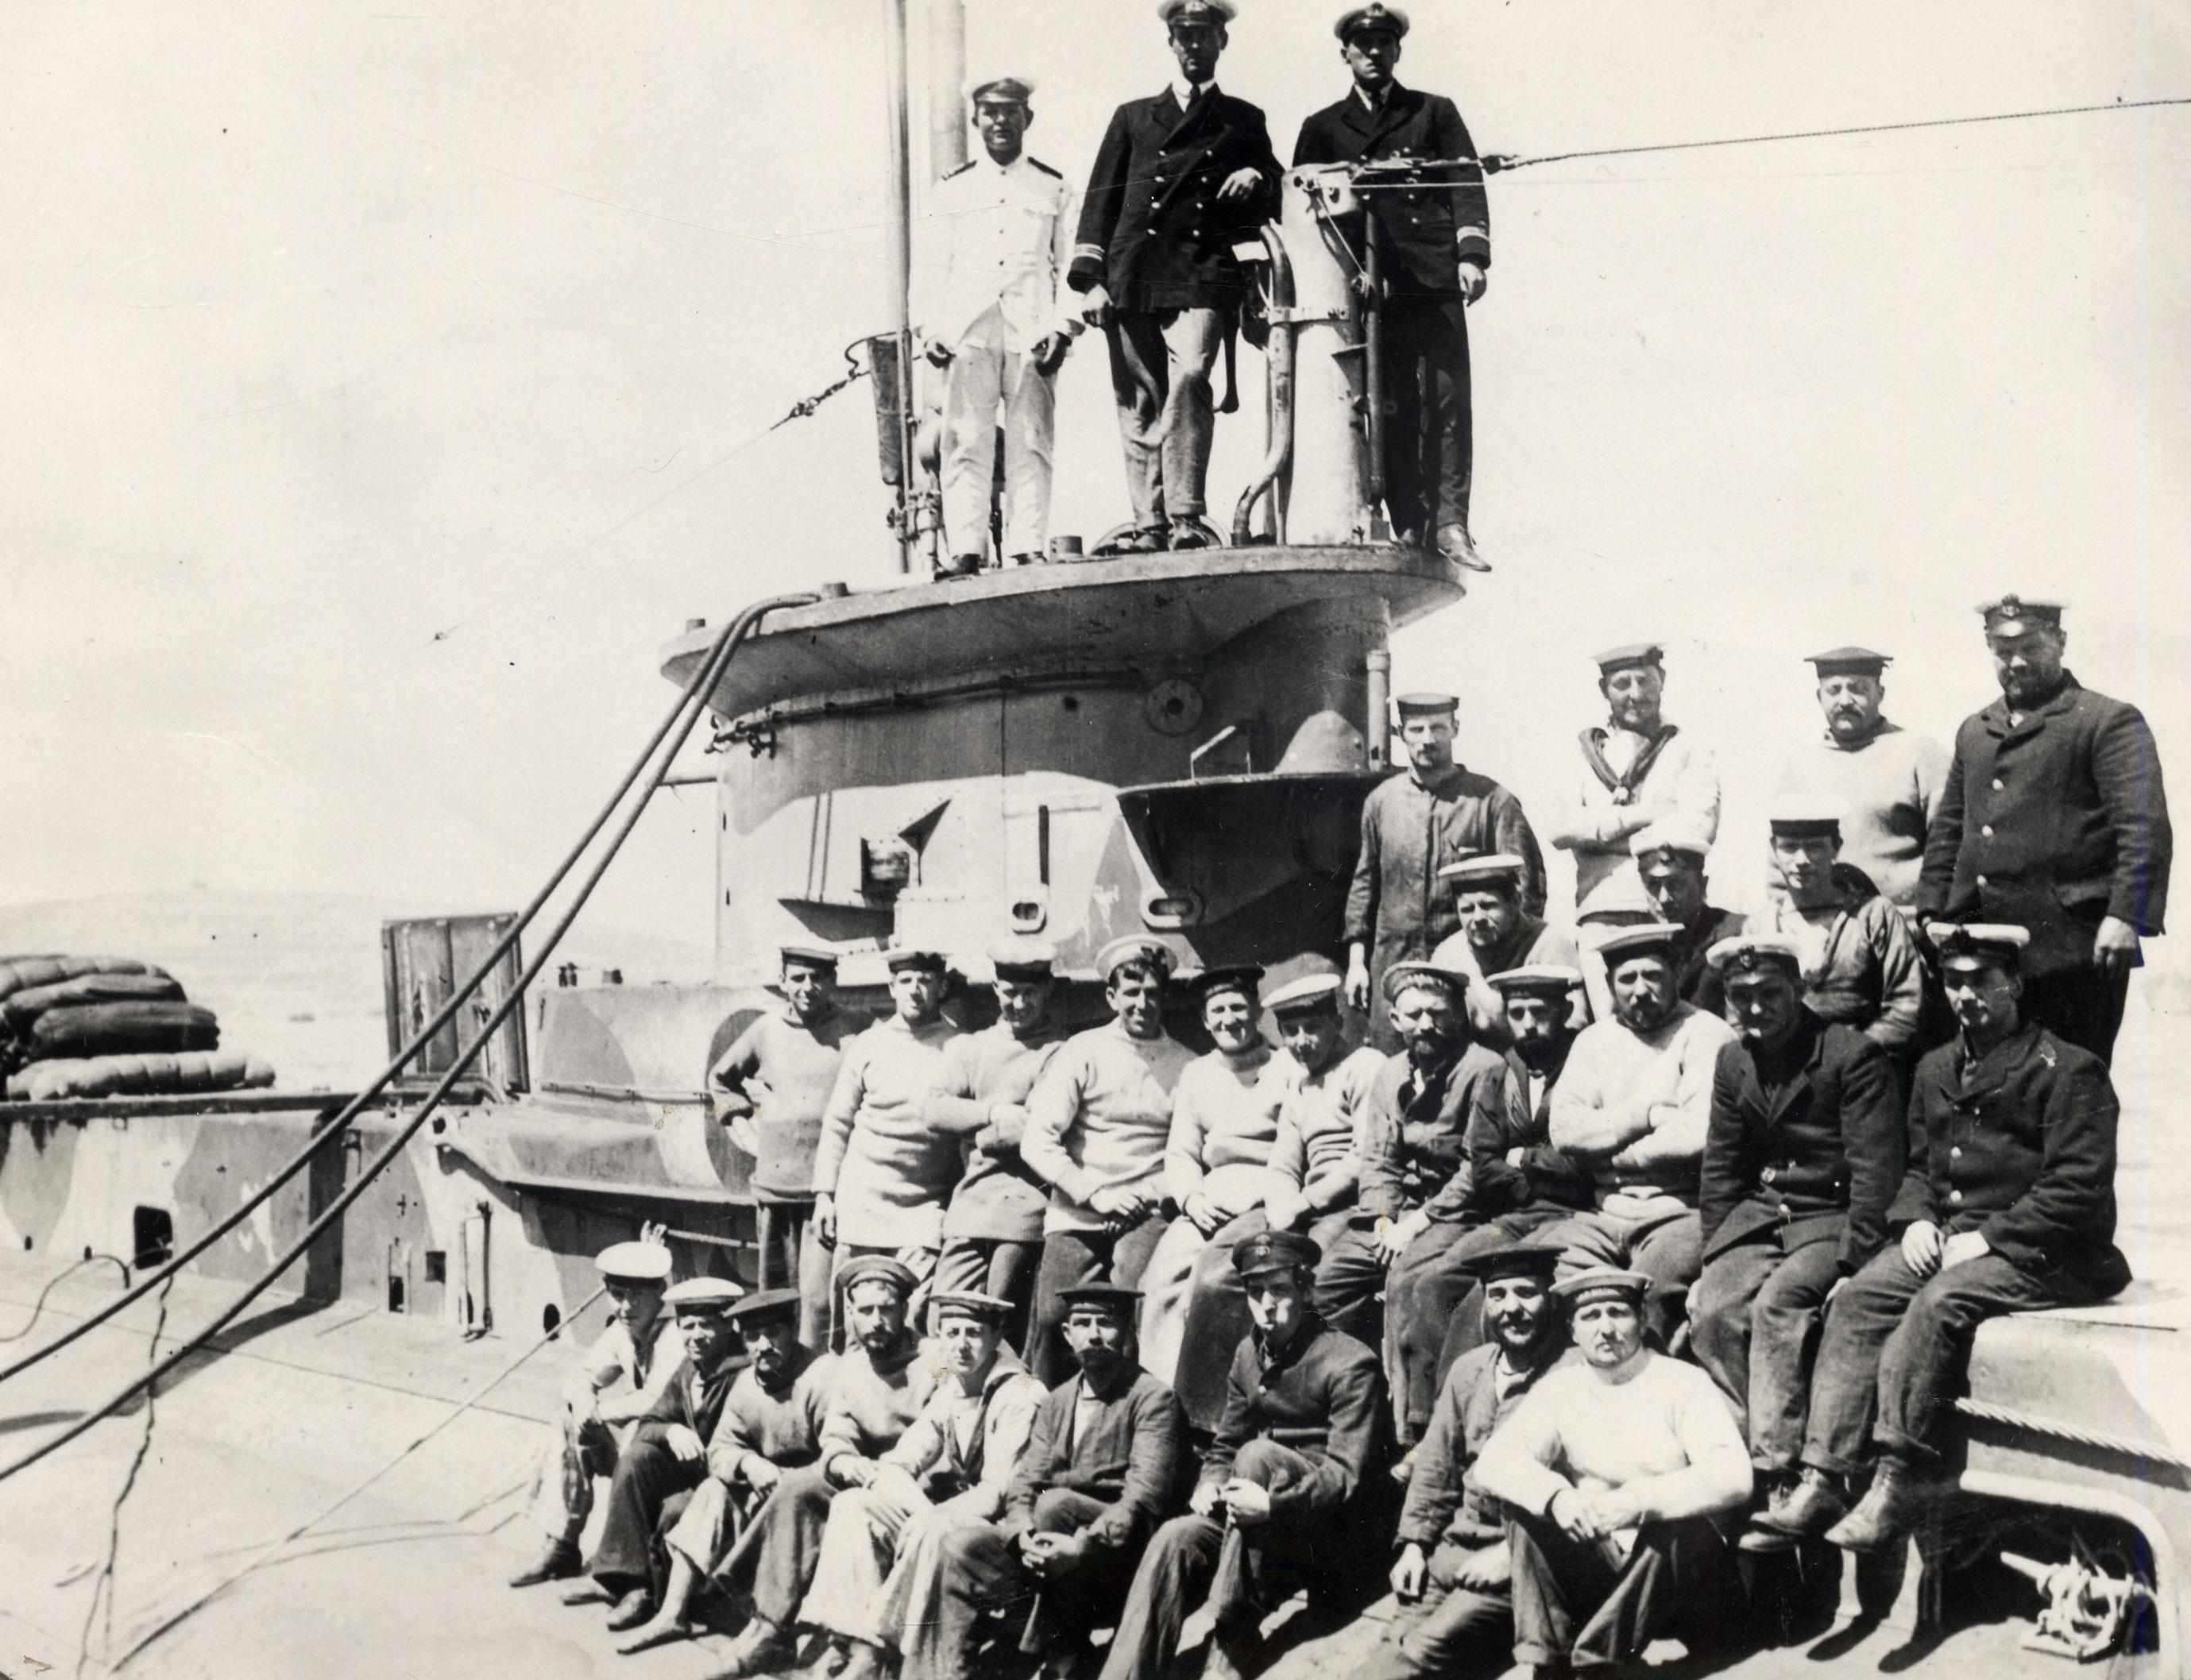 36-E14-Crew-on-bridge-casing-Negs-3145-8431A-b76fe62